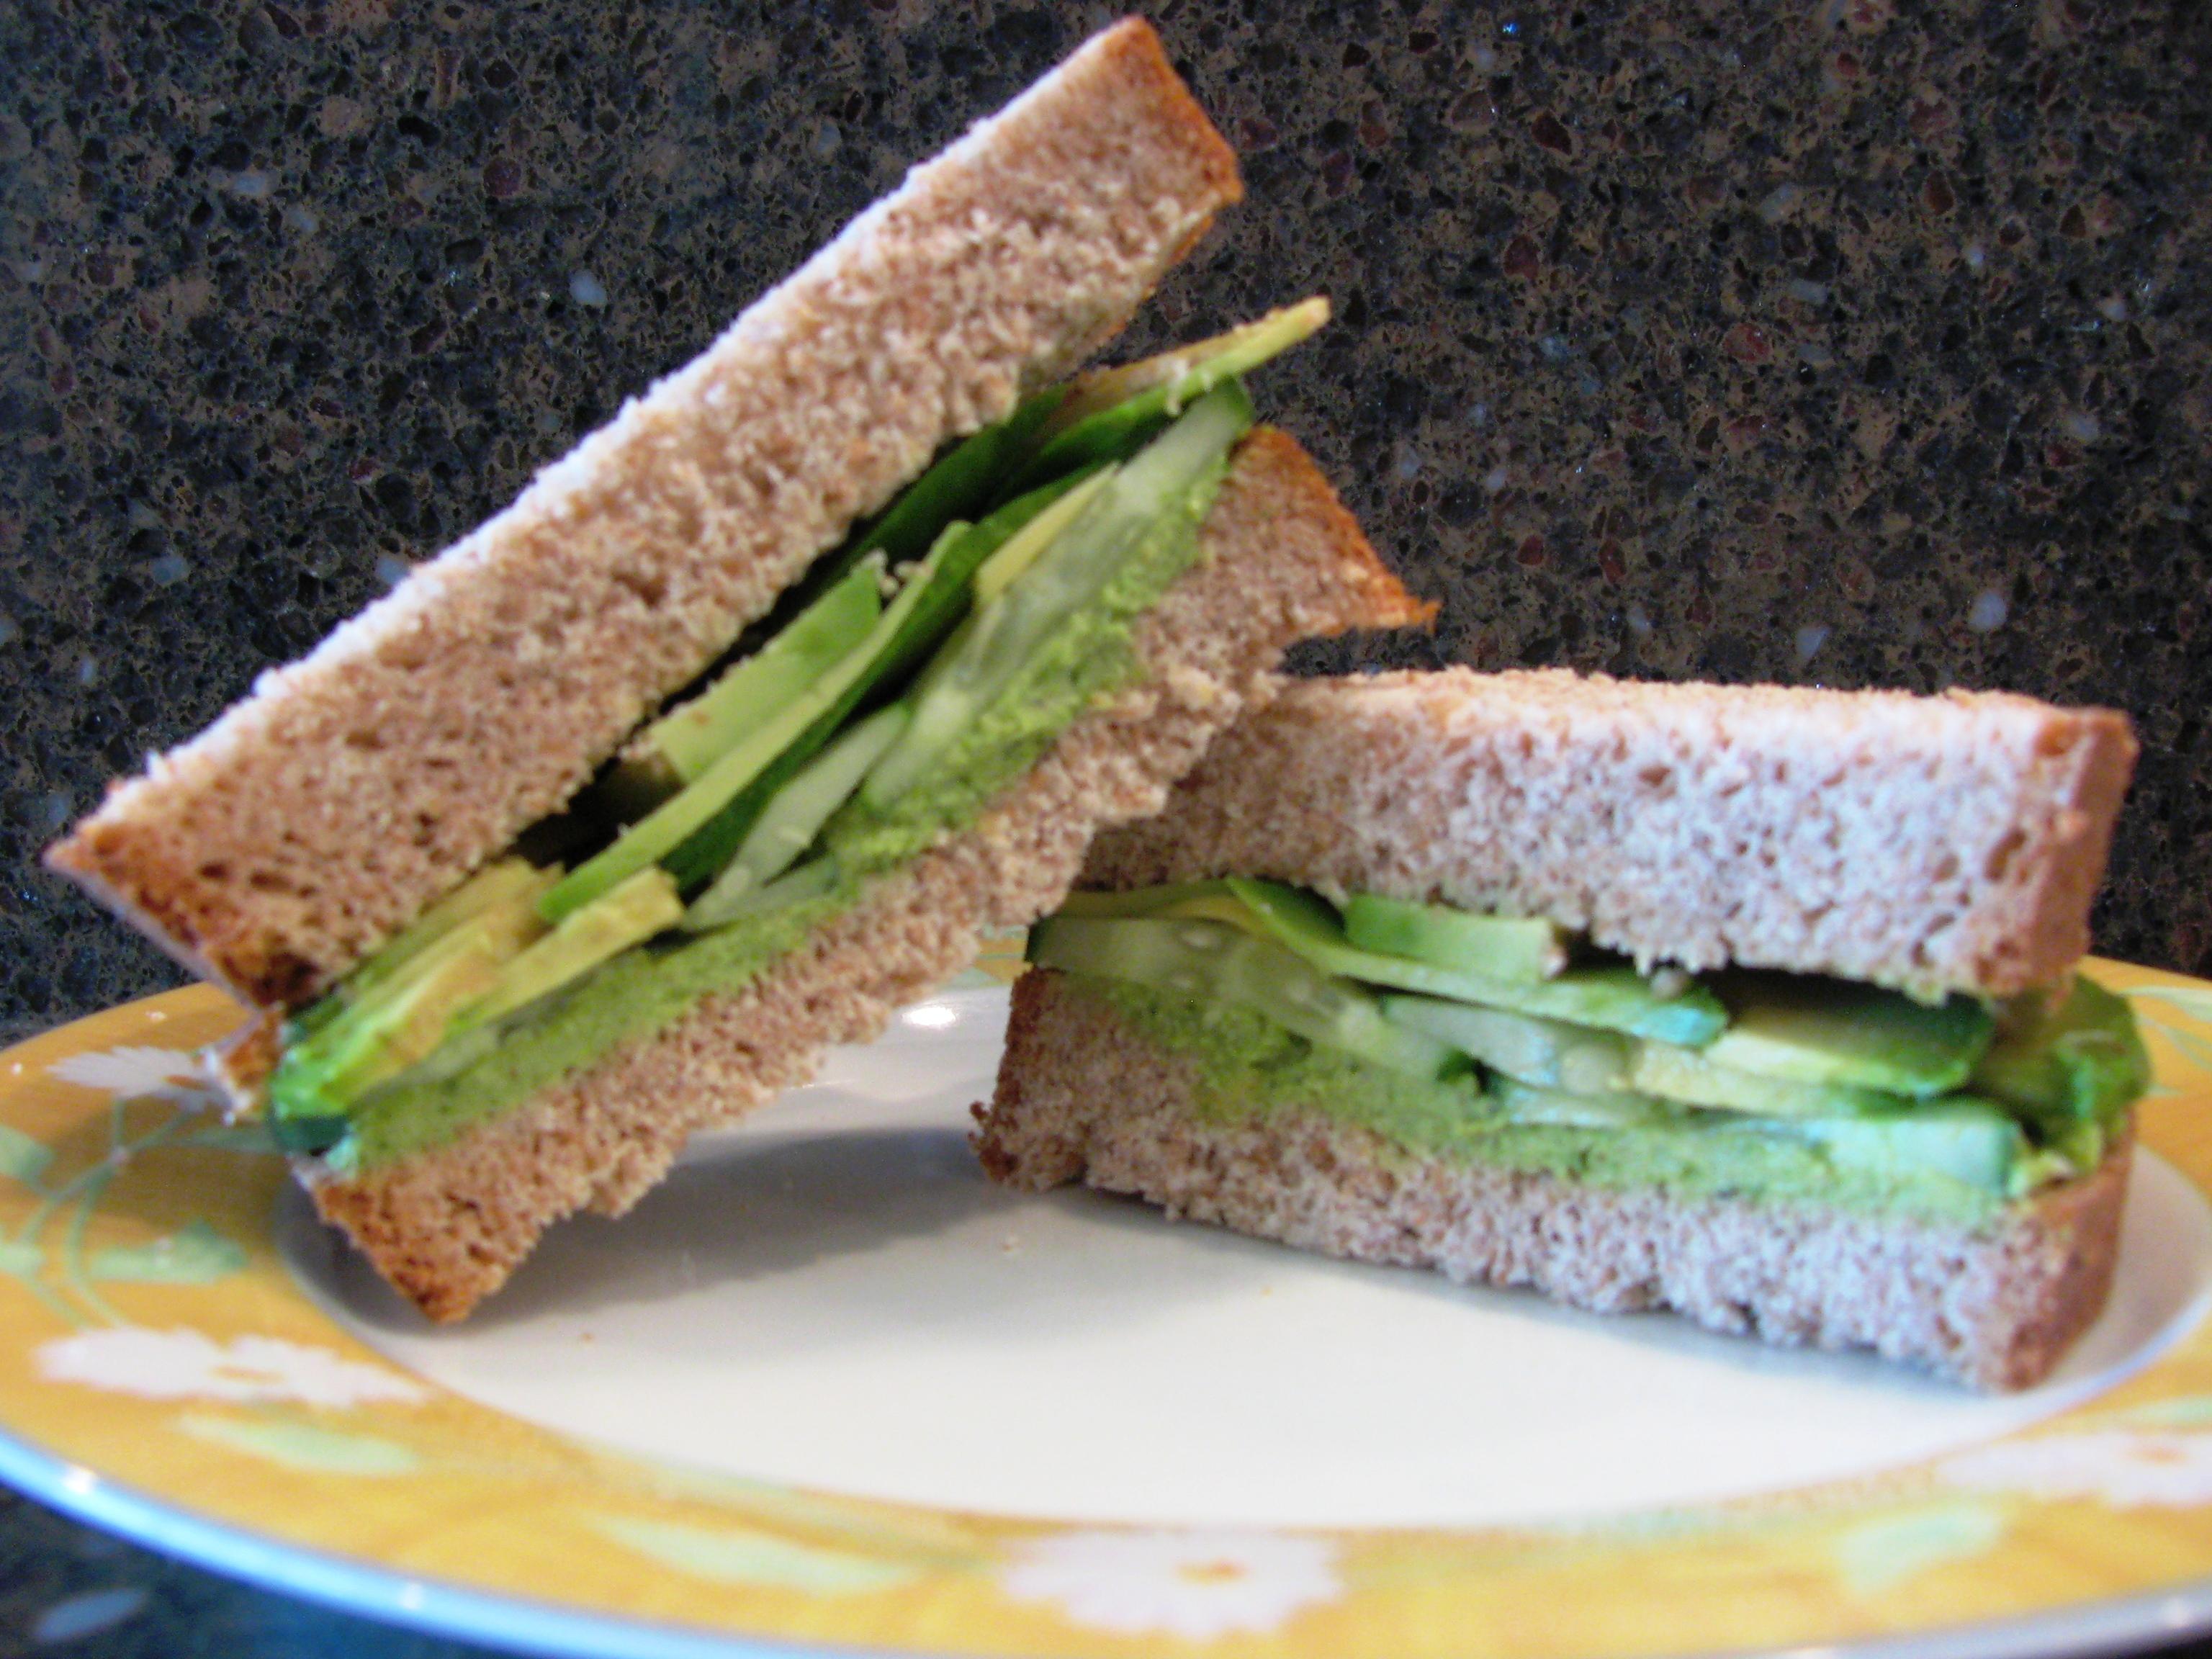 Green Hummus, Avocado, and Cucumber Sandwich   Duke's House